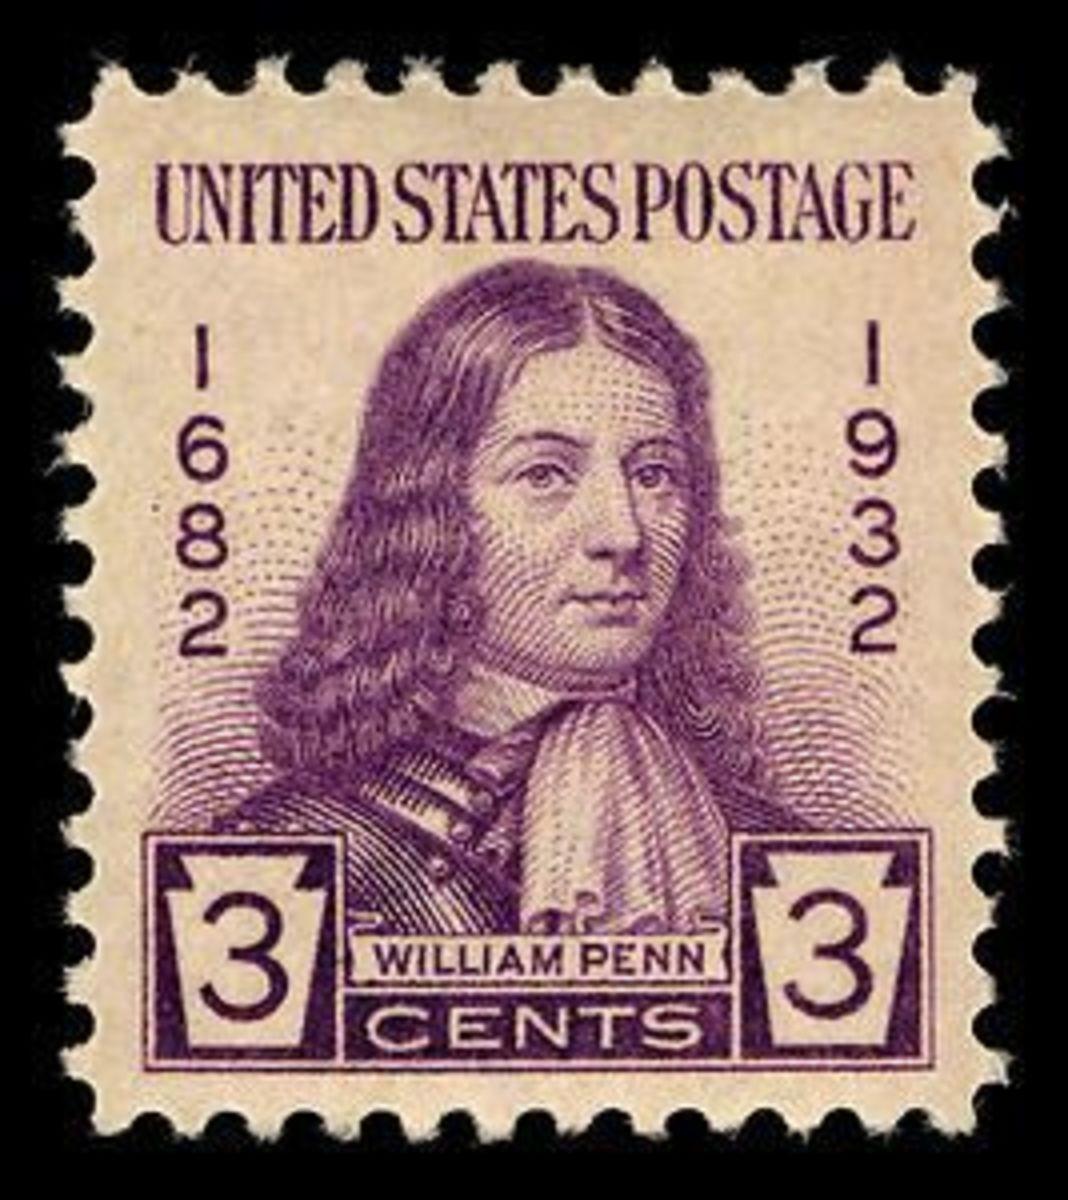 1932 Three Cent U.S. Postage stamp commemorating William Penn.